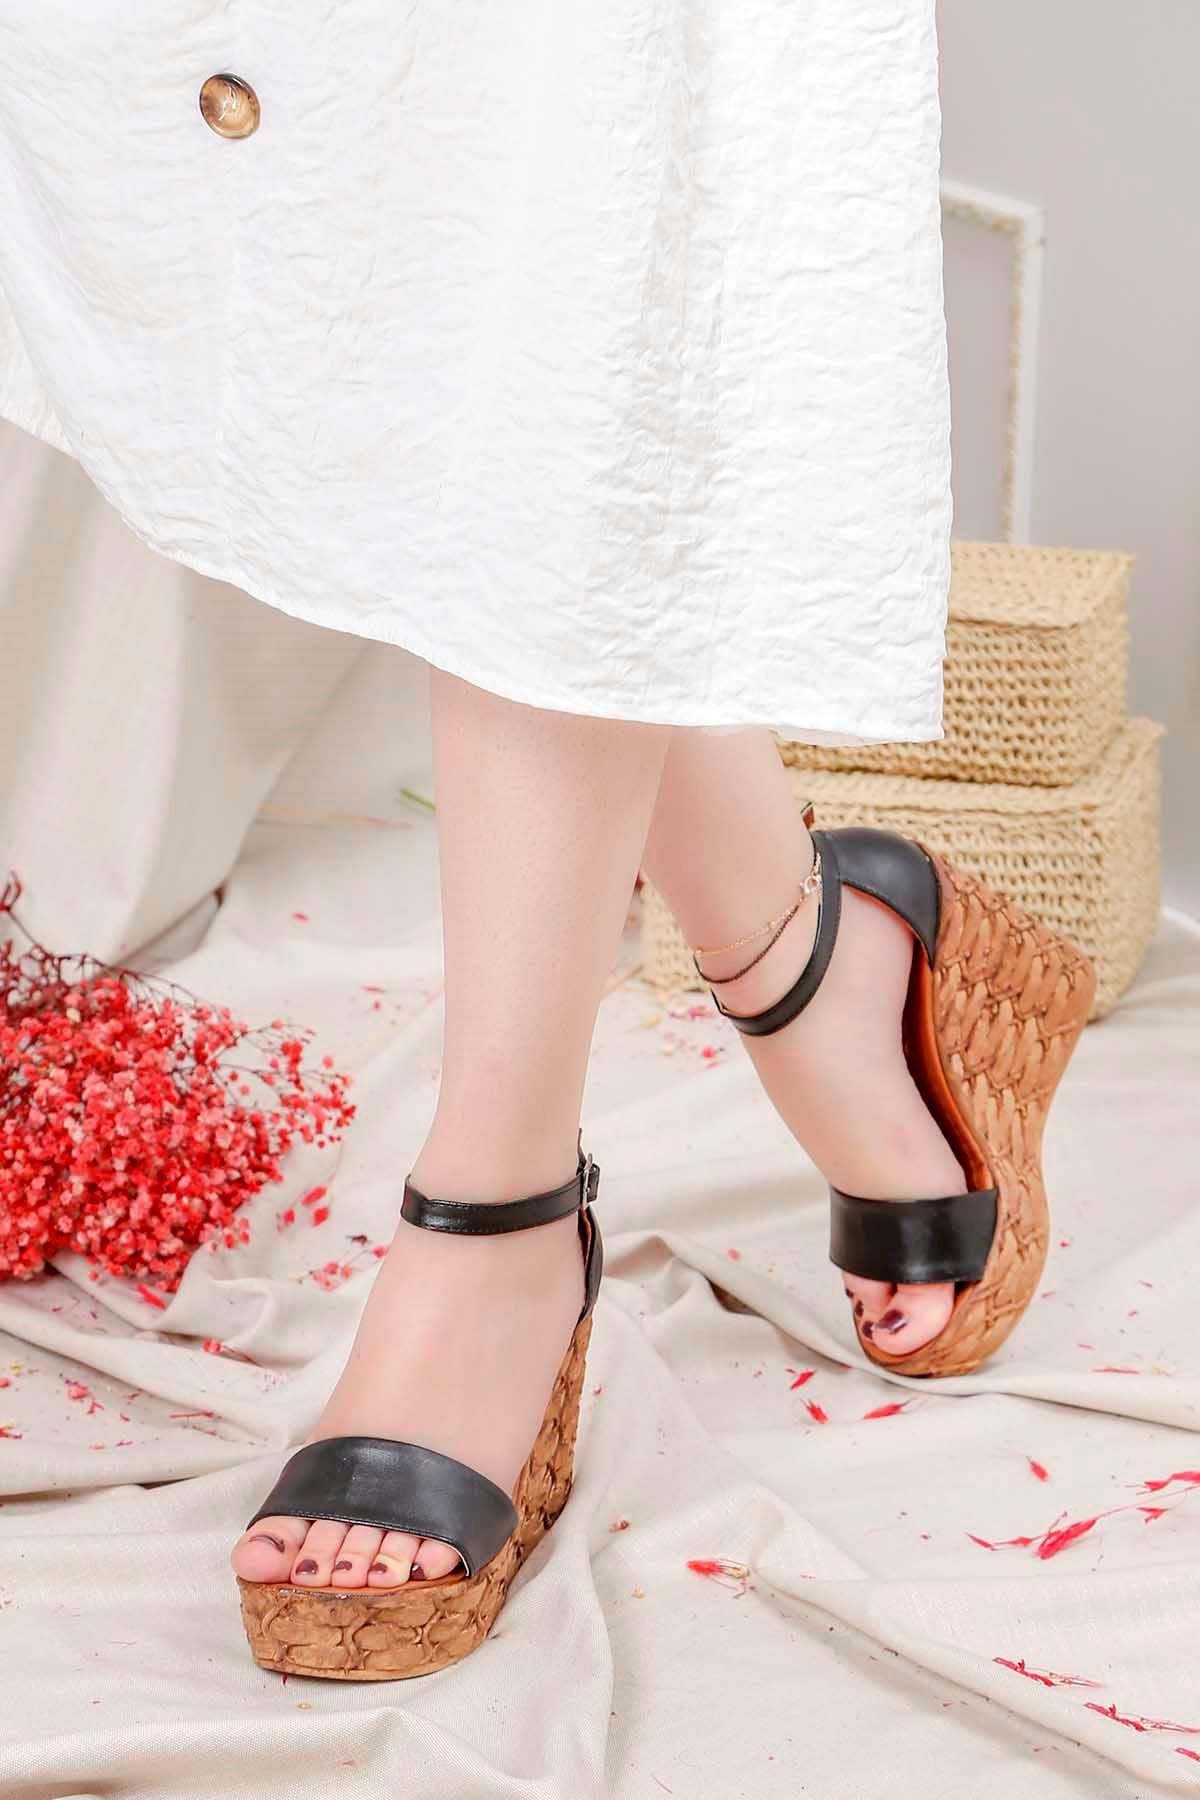 Frm-001 Yüksek Taban Sandalet Siyah Deri